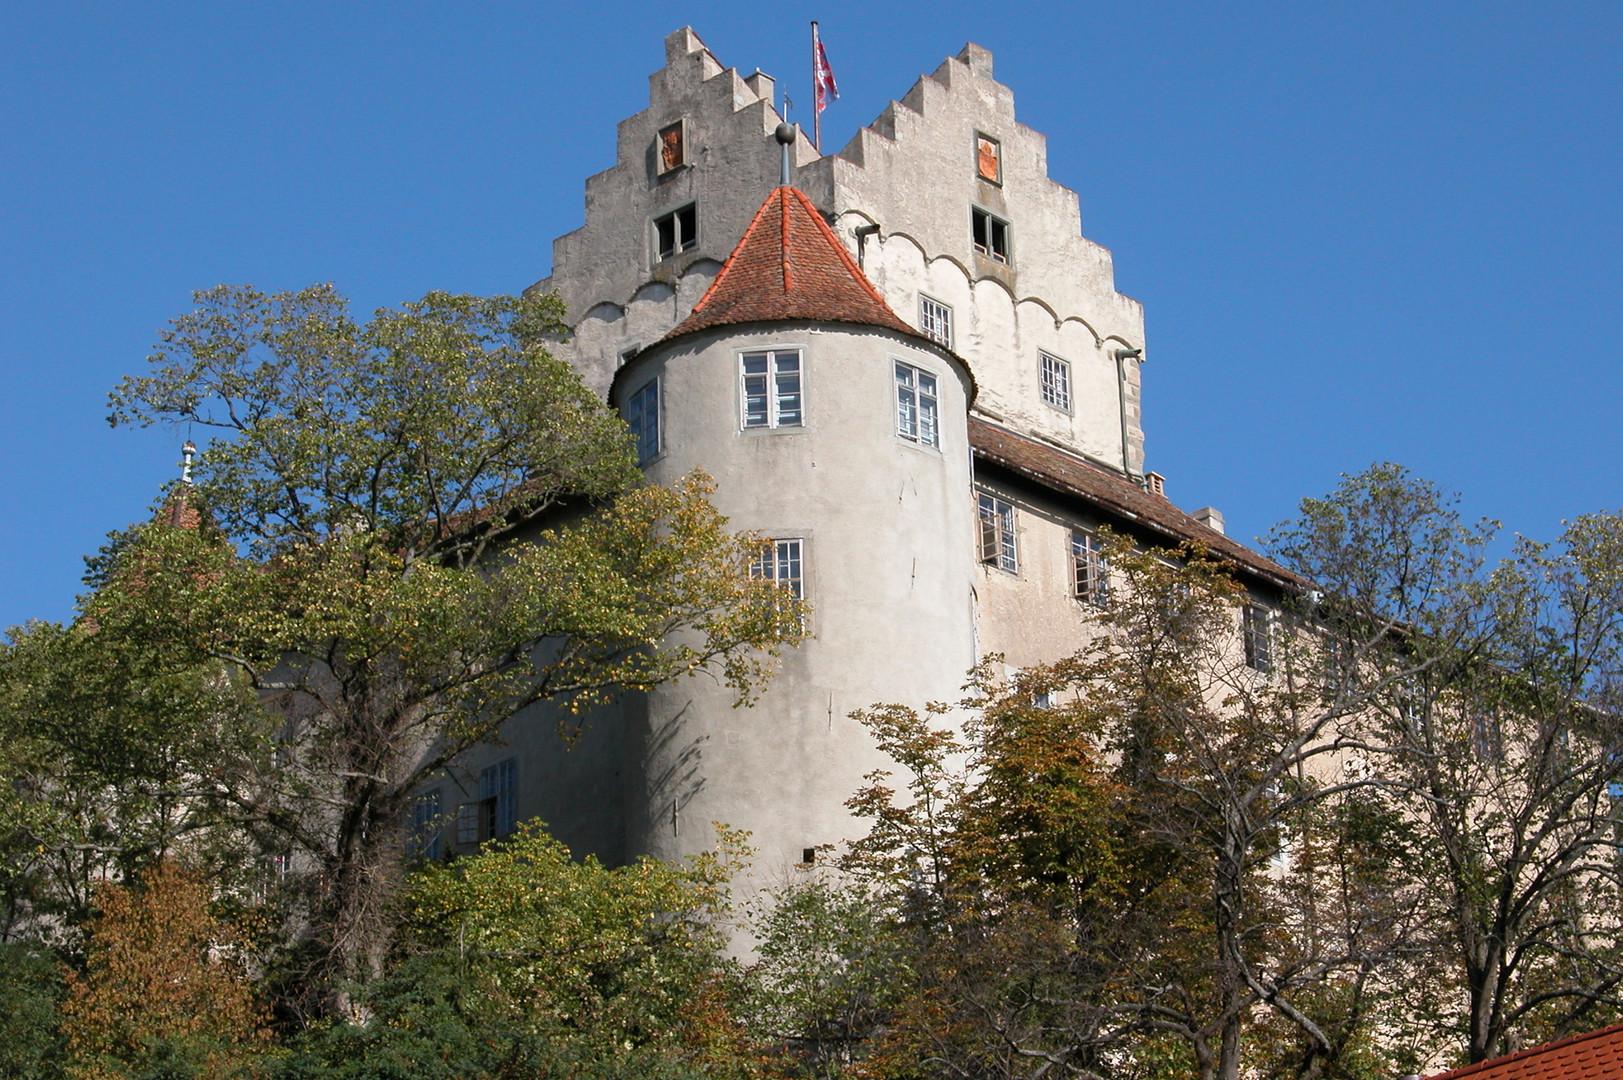 Märchenschloss am Bodensee